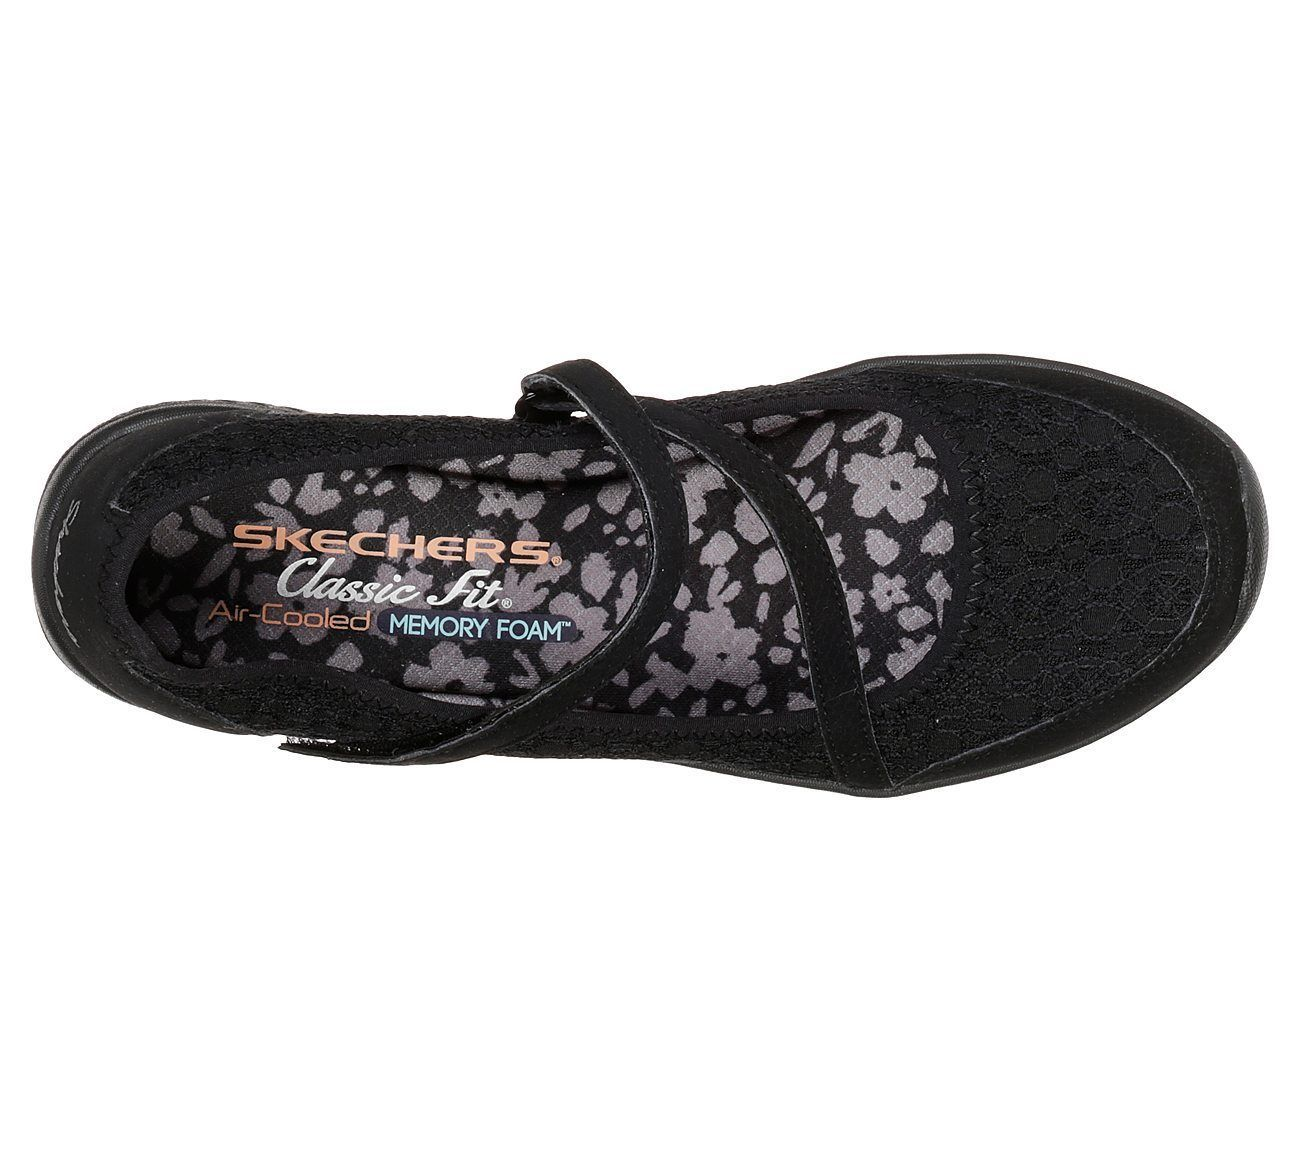 23258 Black Skechers shoes Memory Foam Women Comfort Casual Soft Mesh Mary Jane